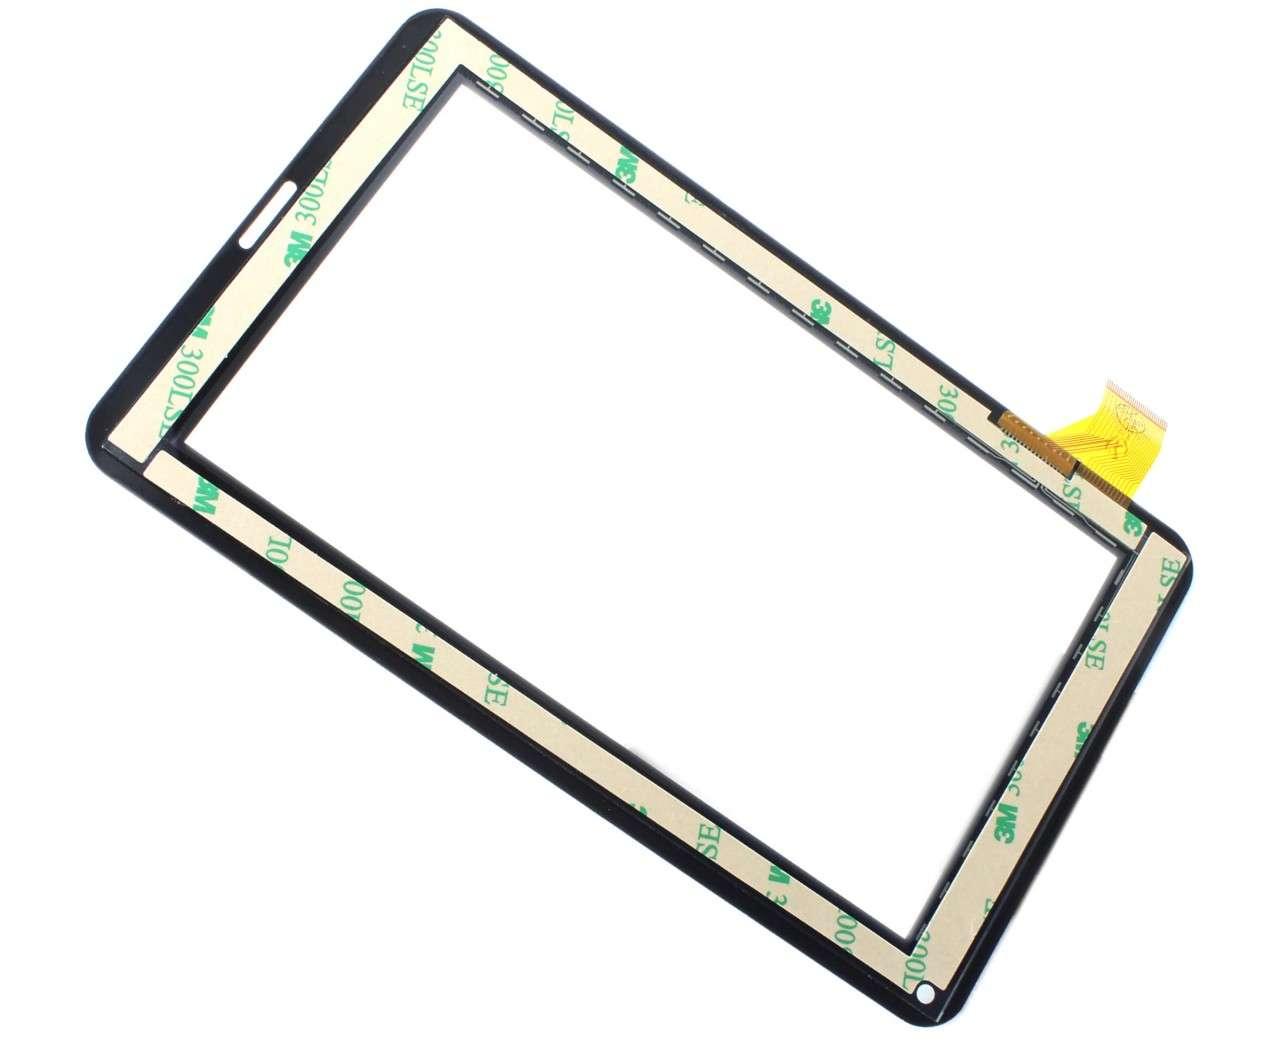 Touchscreen Digitizer Myria Play DBX K721 Geam Sticla Tableta imagine powerlaptop.ro 2021